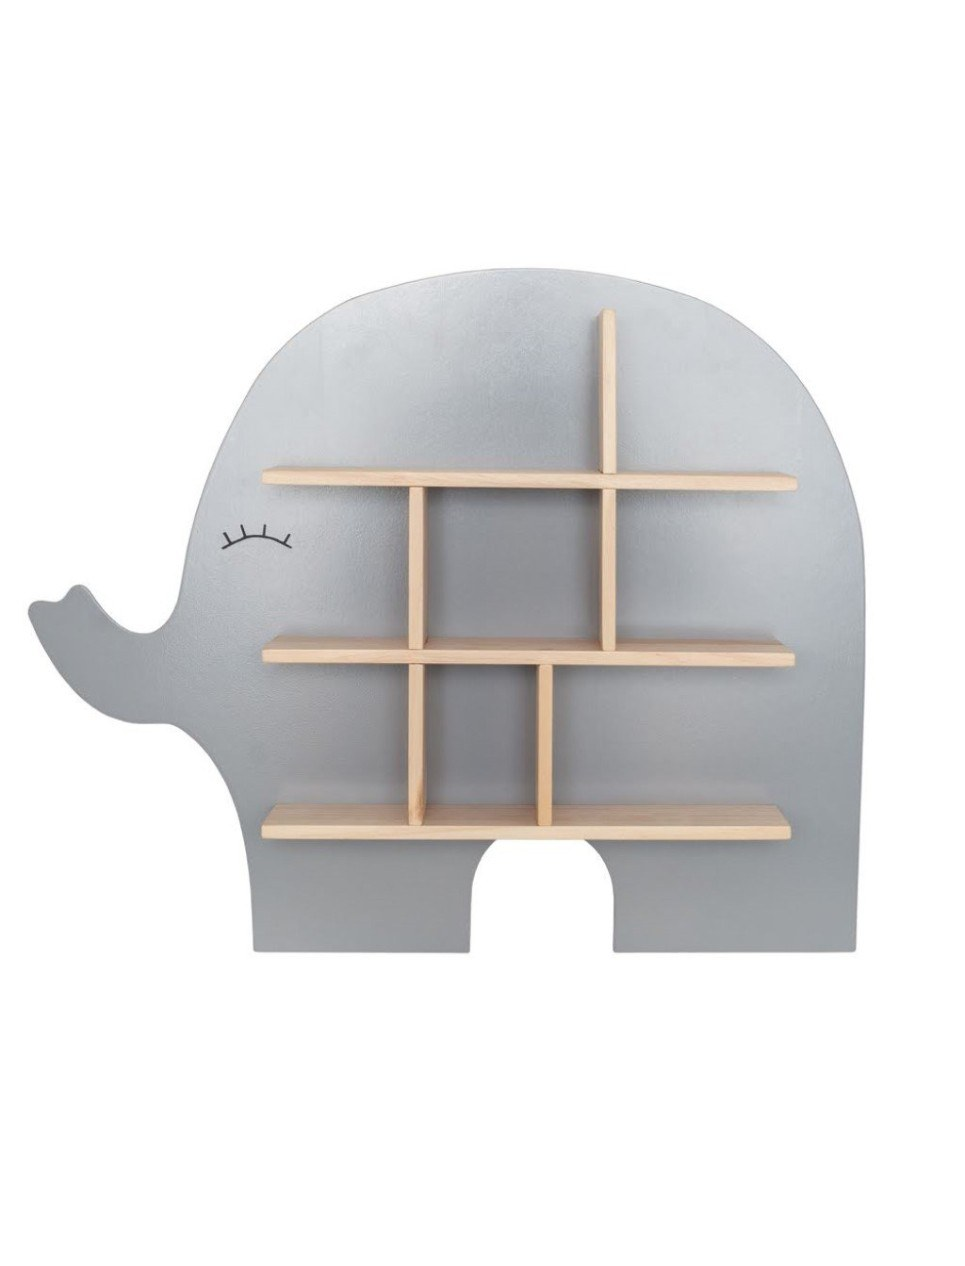 Elephant Children's Wall Shelf